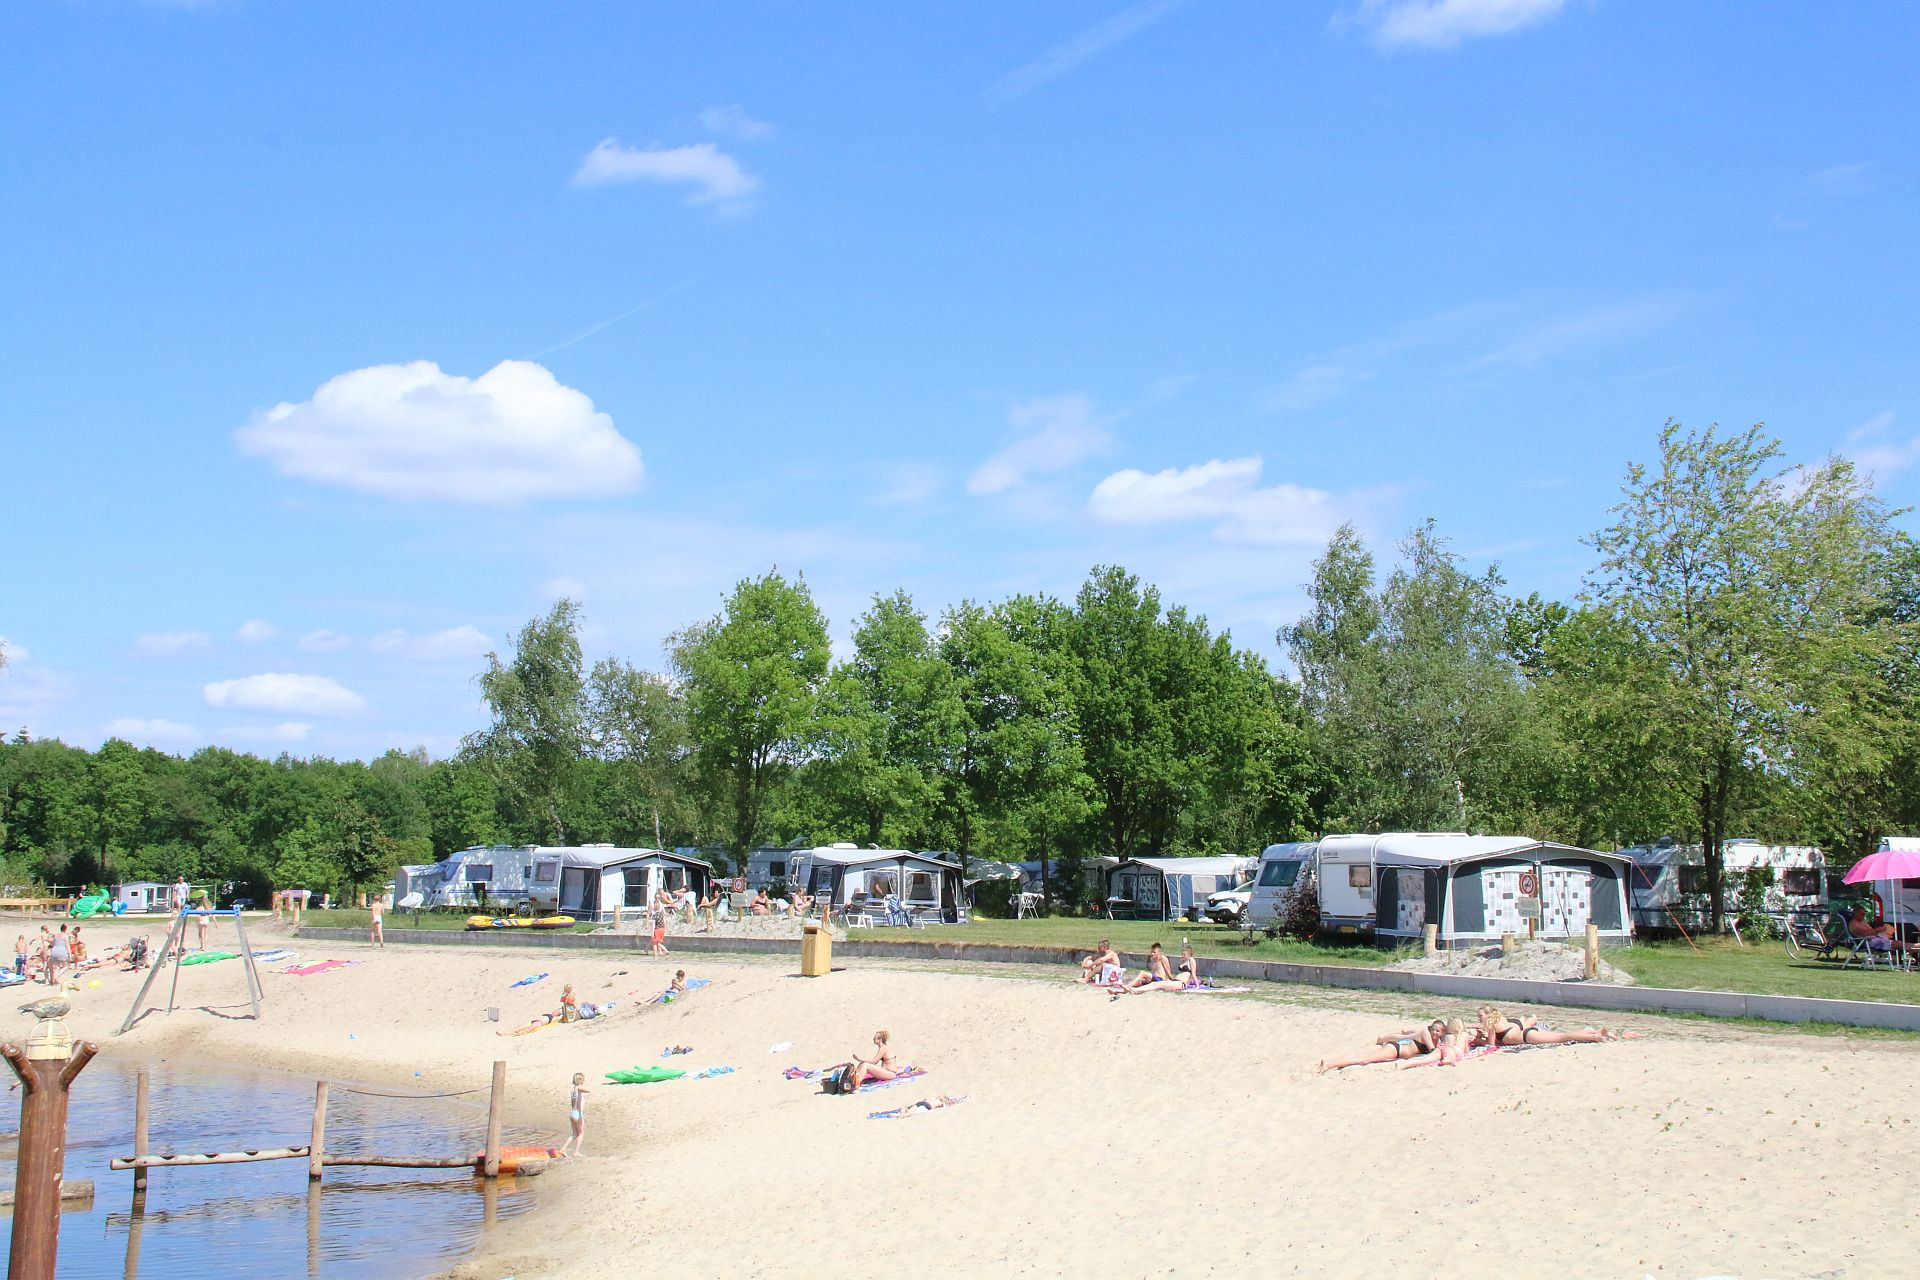 5 Sterne Campingplatz in Hardenberg Het Stoetenslagh - Campingplatz Hardenberg